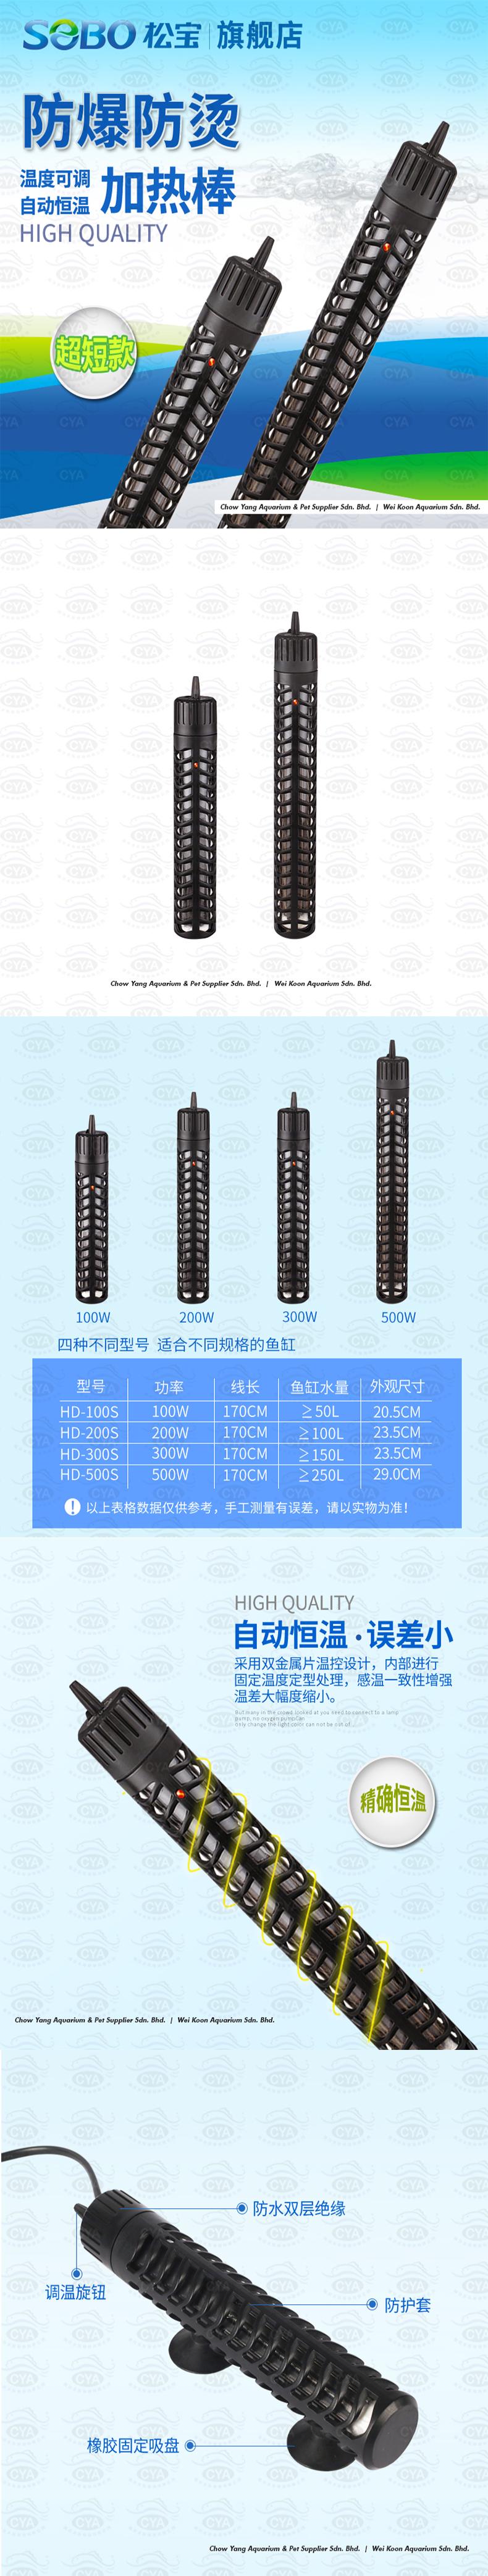 HD Series Heater - Modal